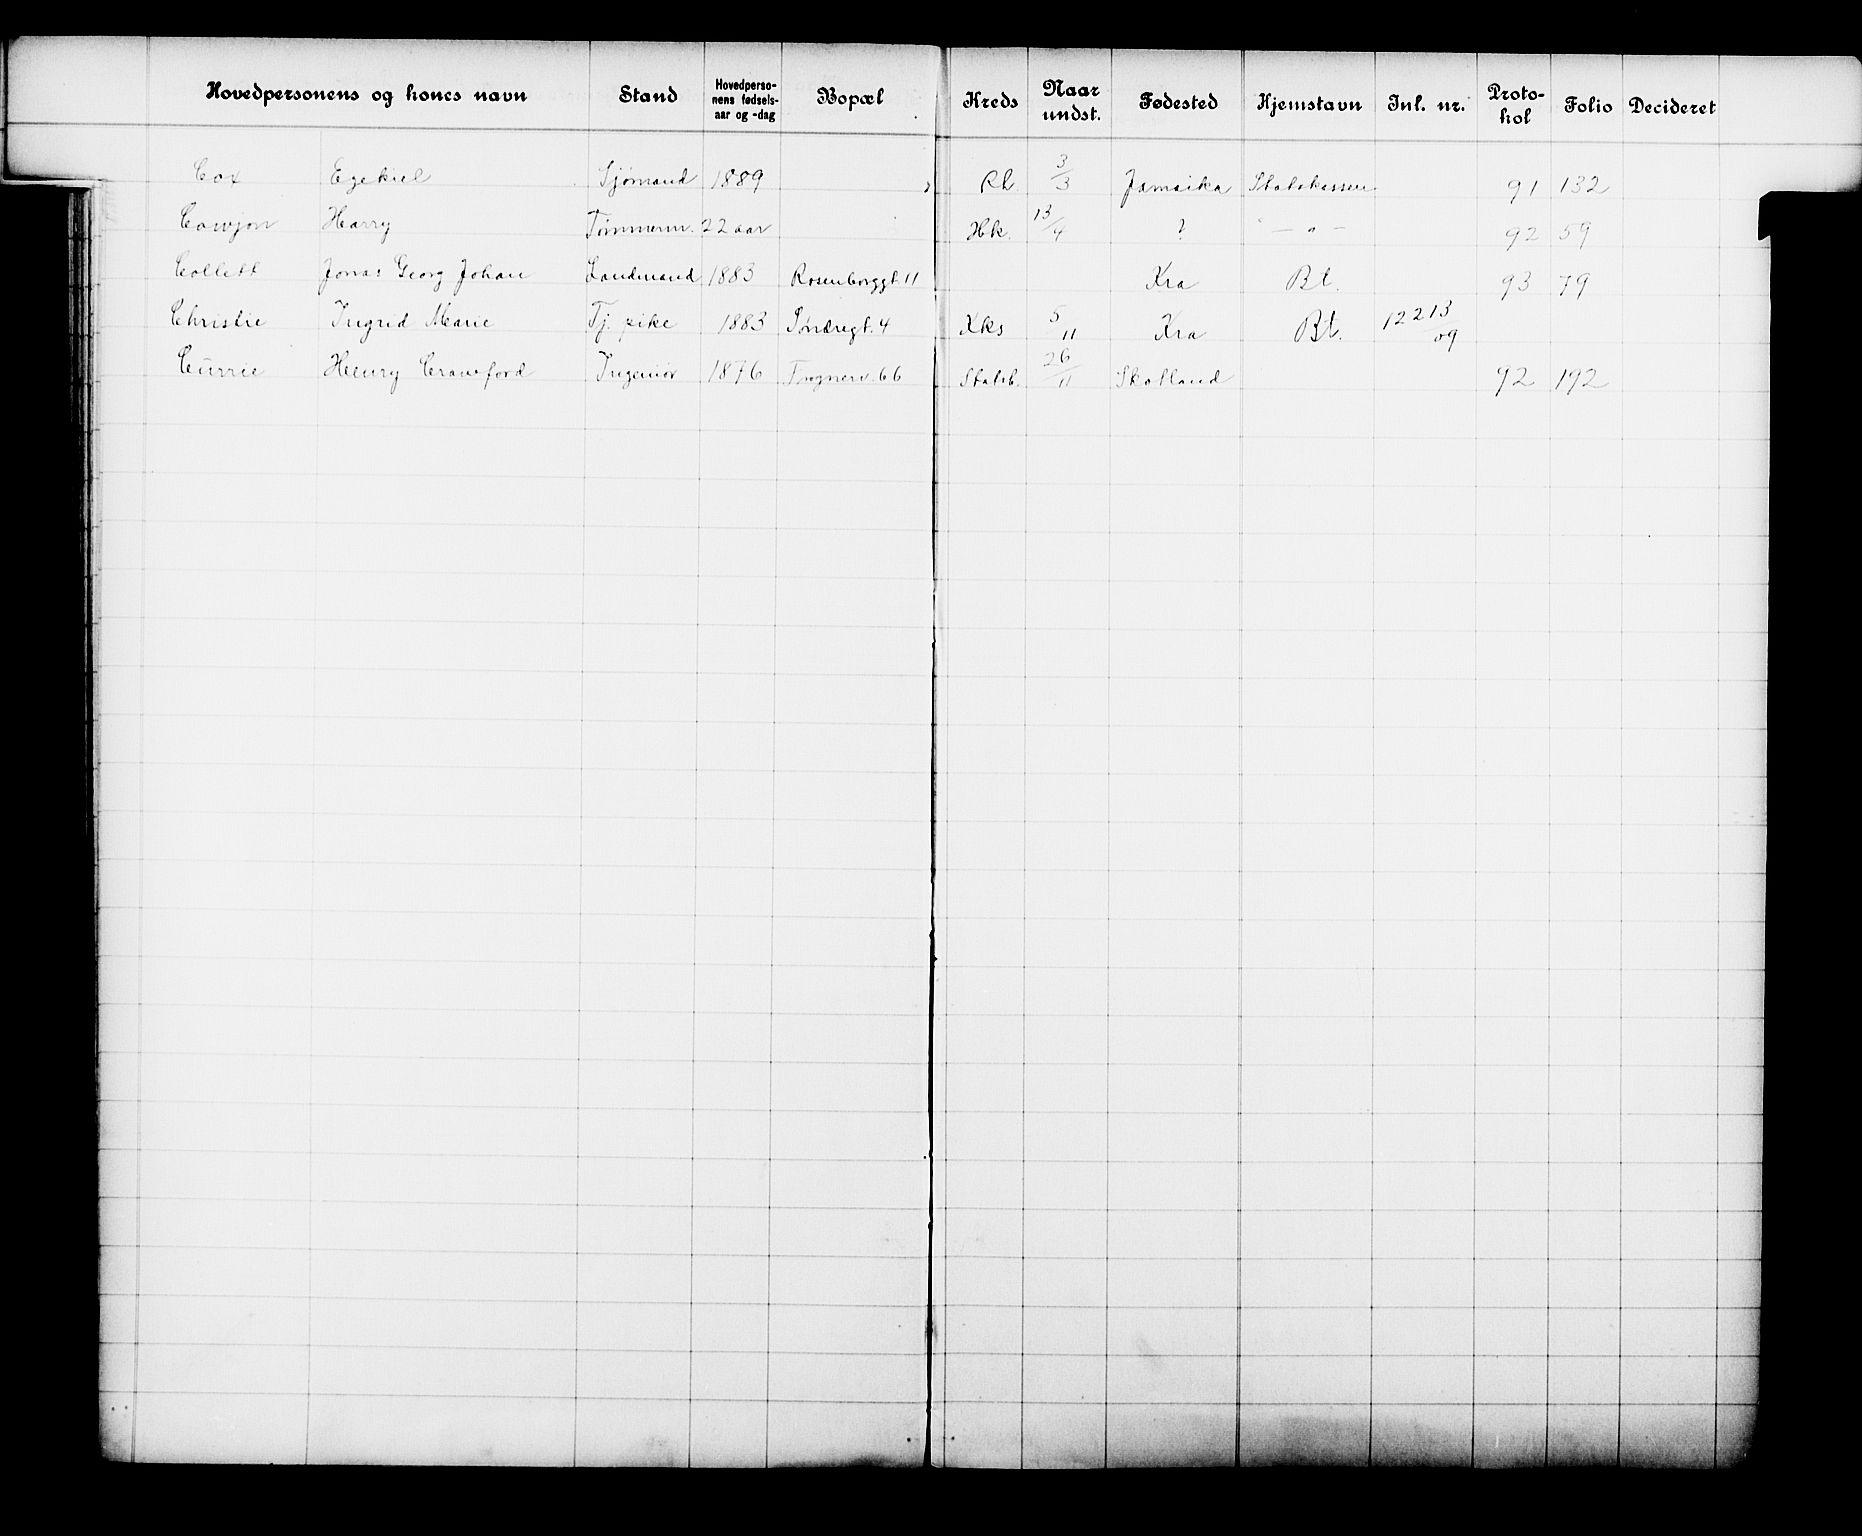 OBA, Fattigvesenet, Fb/L0028: Hjemstavnsregister, 1909, s. 29